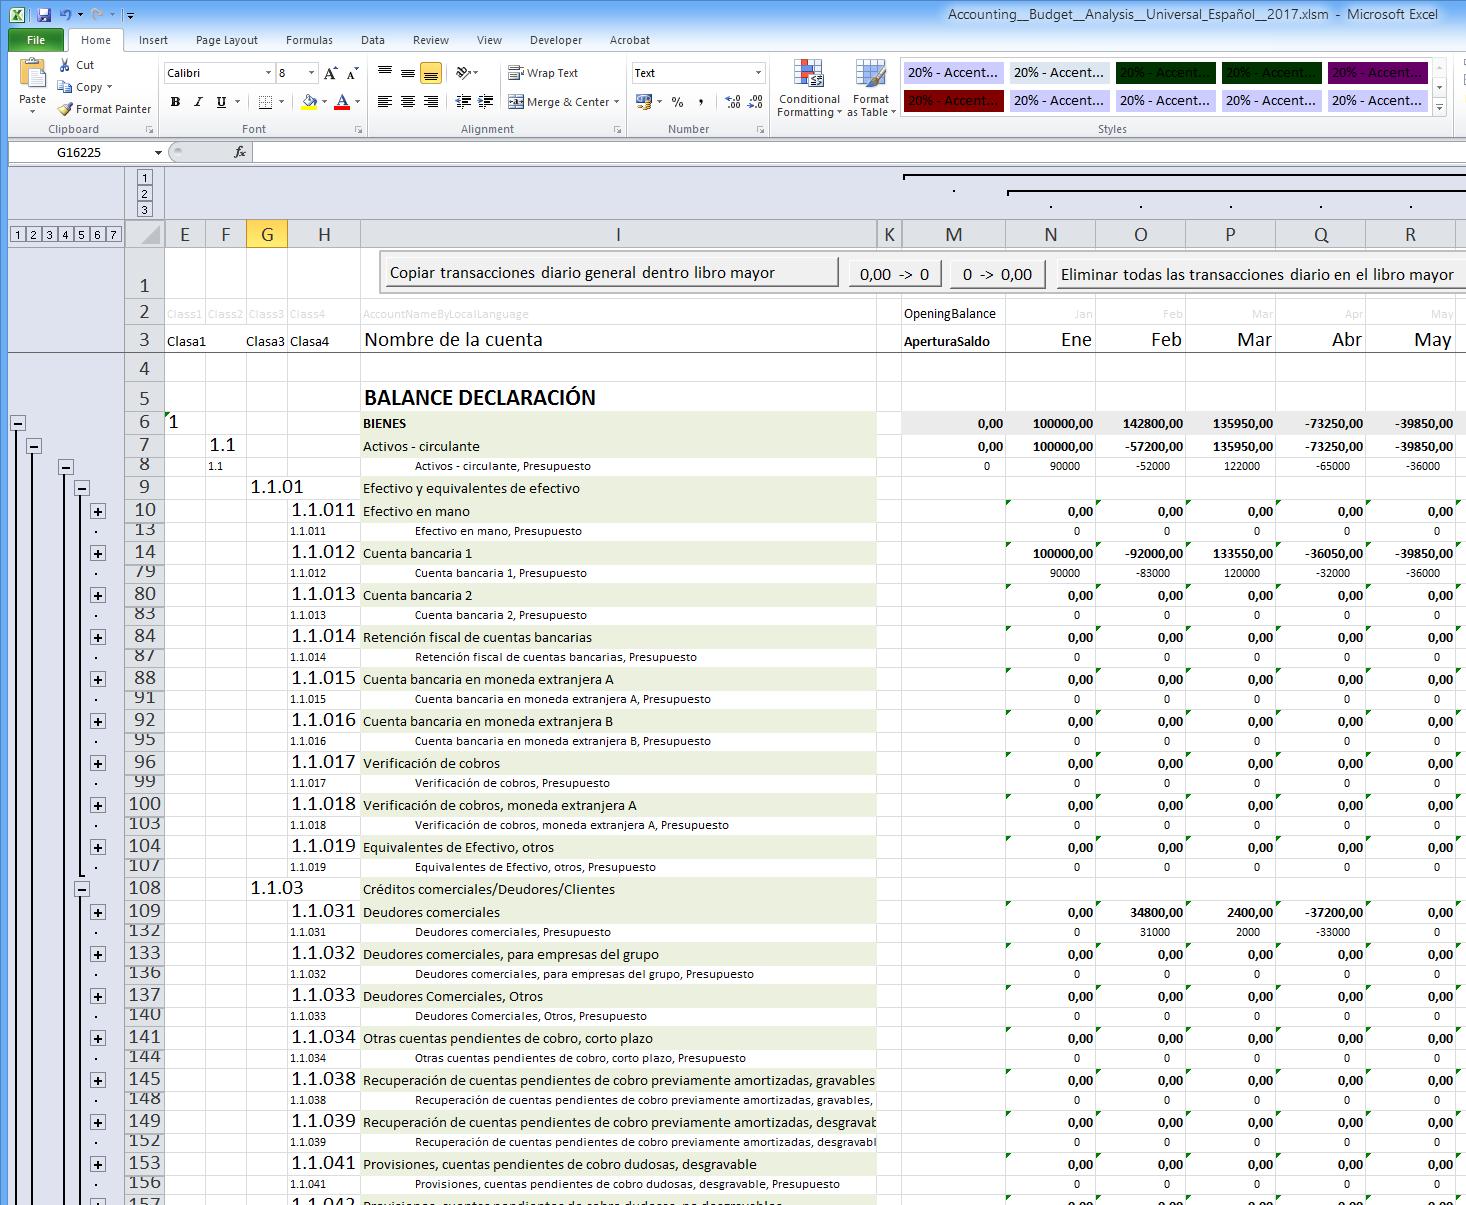 Budget Analysis Excel Ukrandiffusion